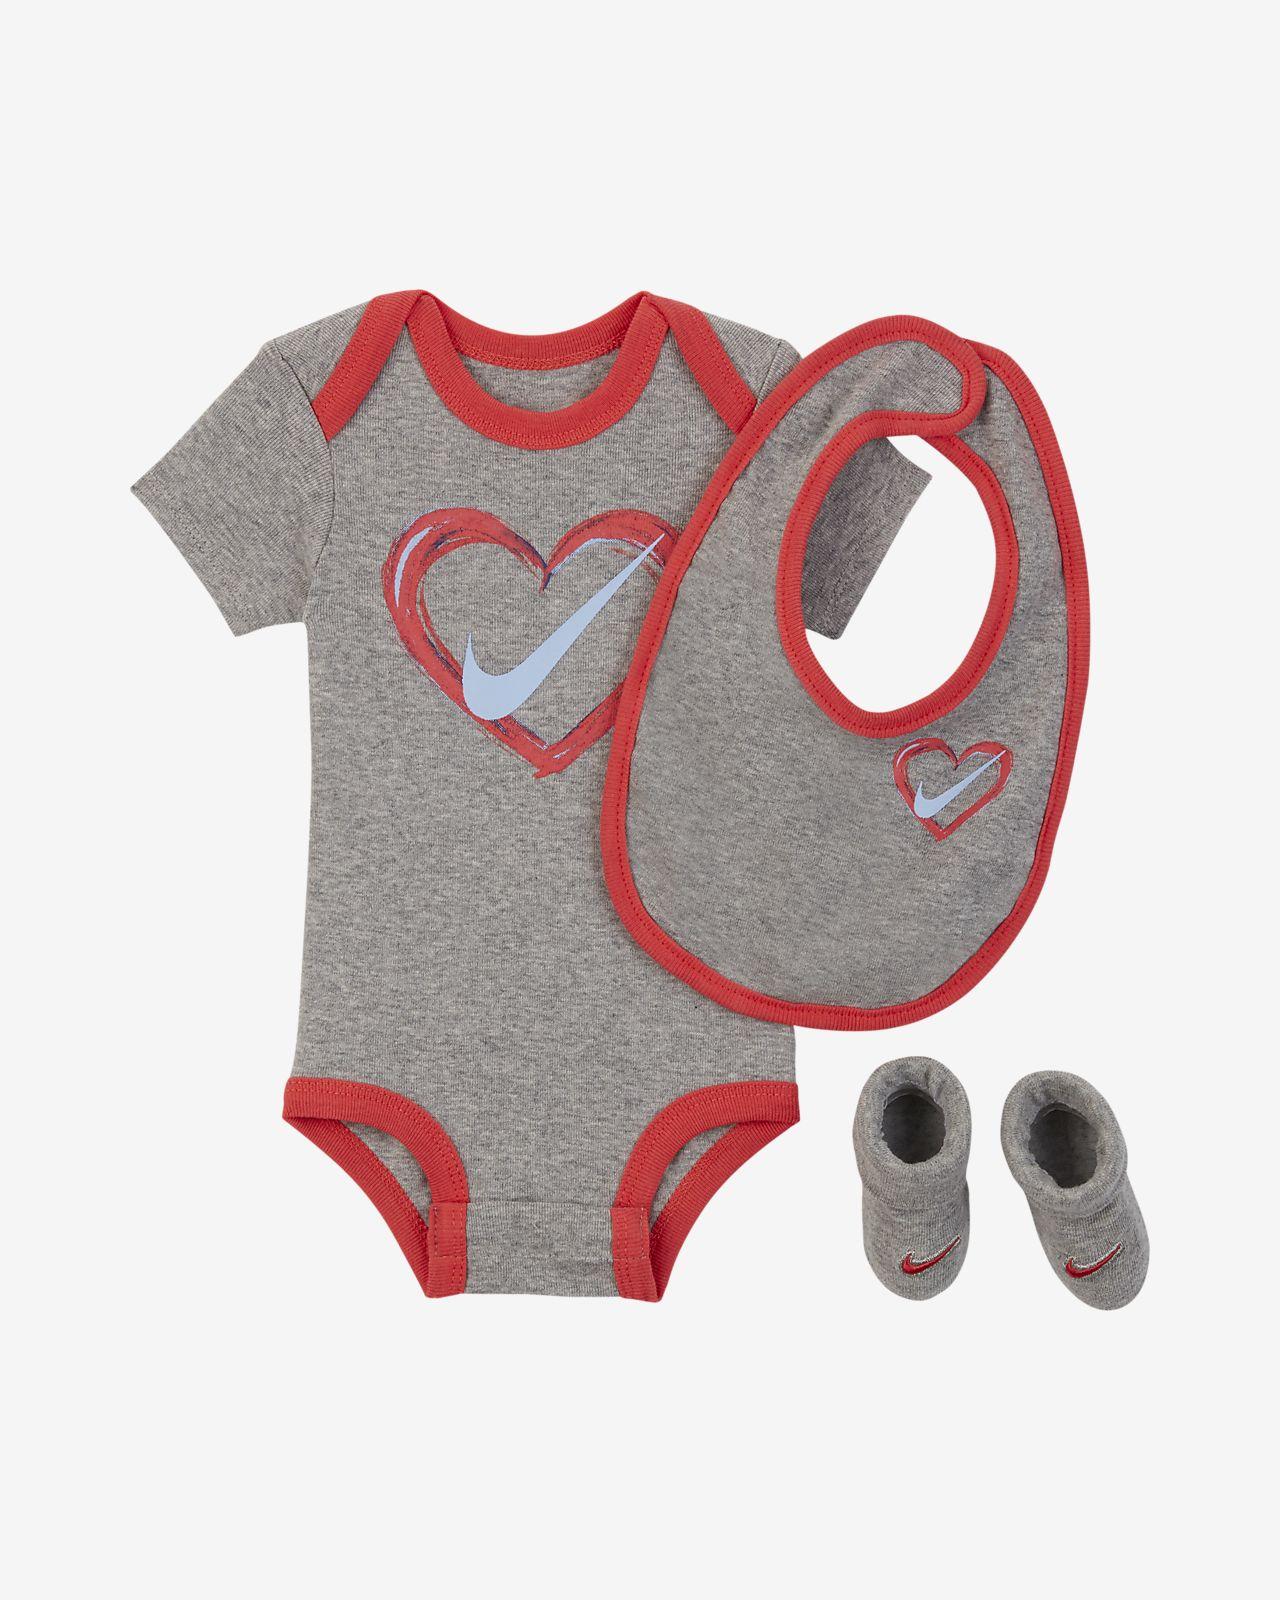 online store ad0df 334ae Nike Baby (12–24M) 3-Piece Set. Nike.com GB